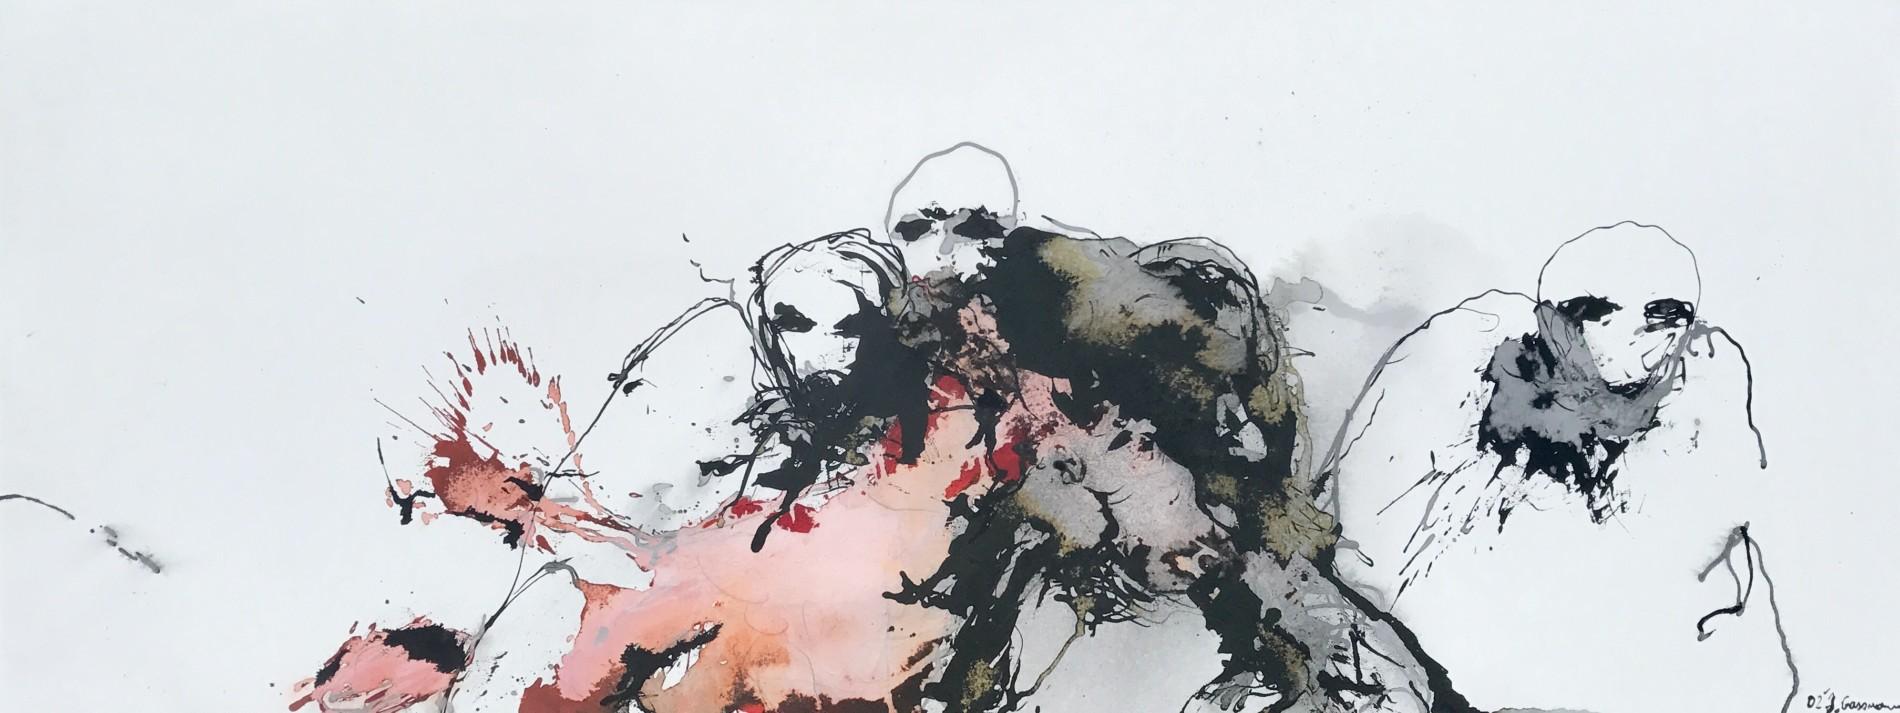 APART OF ME : figures expecting, (2002)70 x 180 cm (28 x 71 inch)